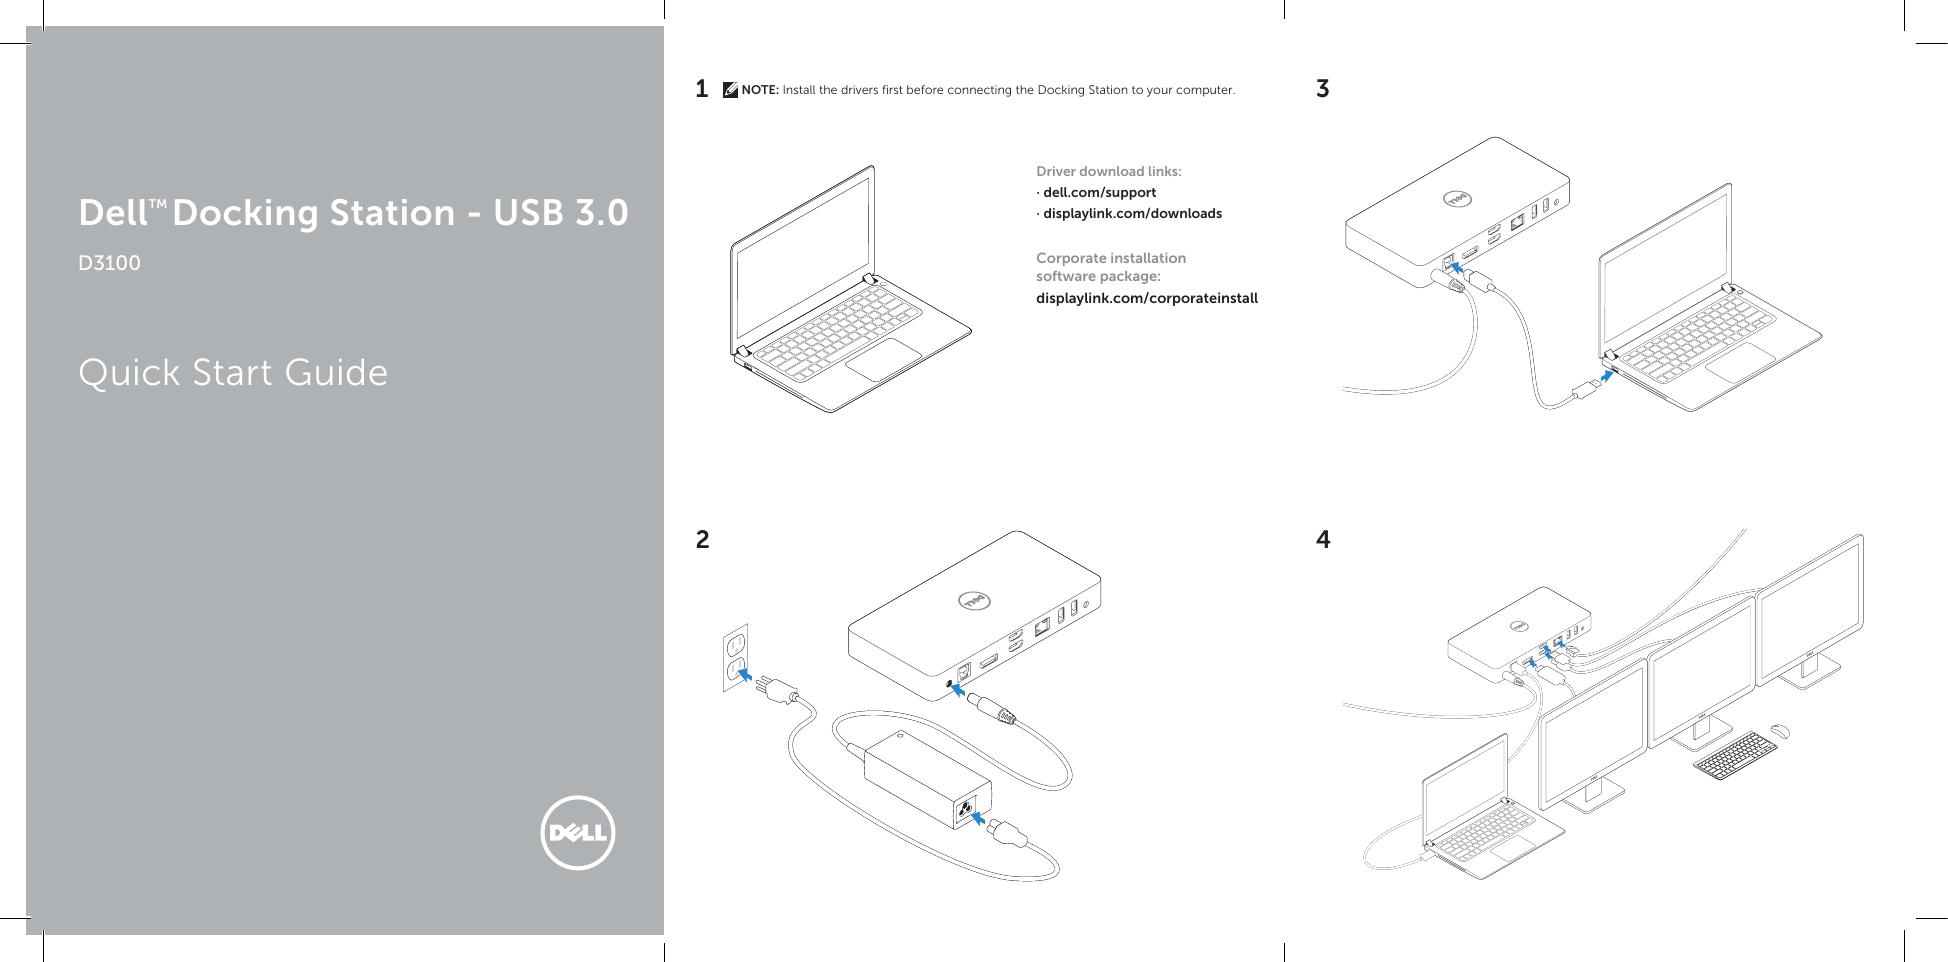 Dell Model D3100 Docking Station Manual Manual Guide